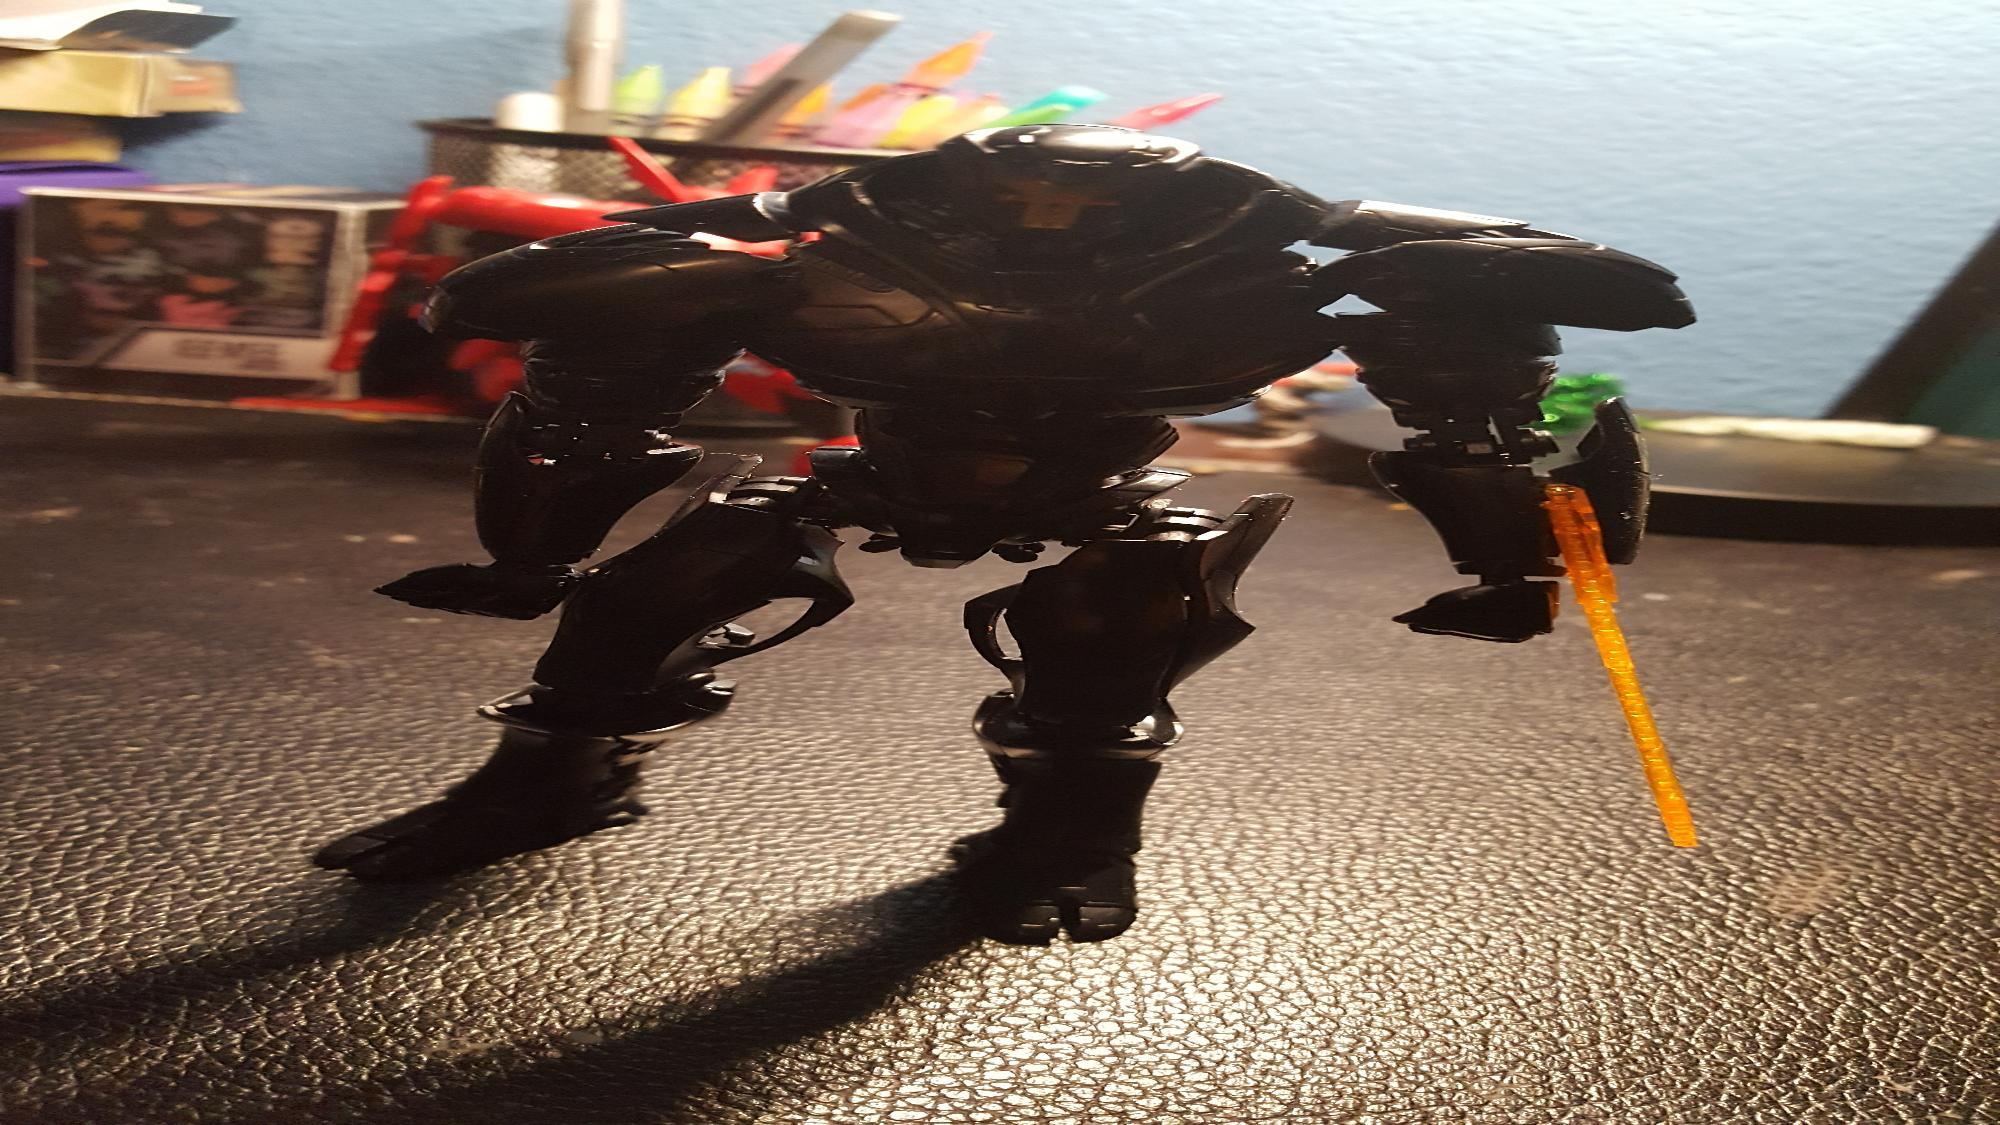 HG 144 Obsidian Fury. How is it?